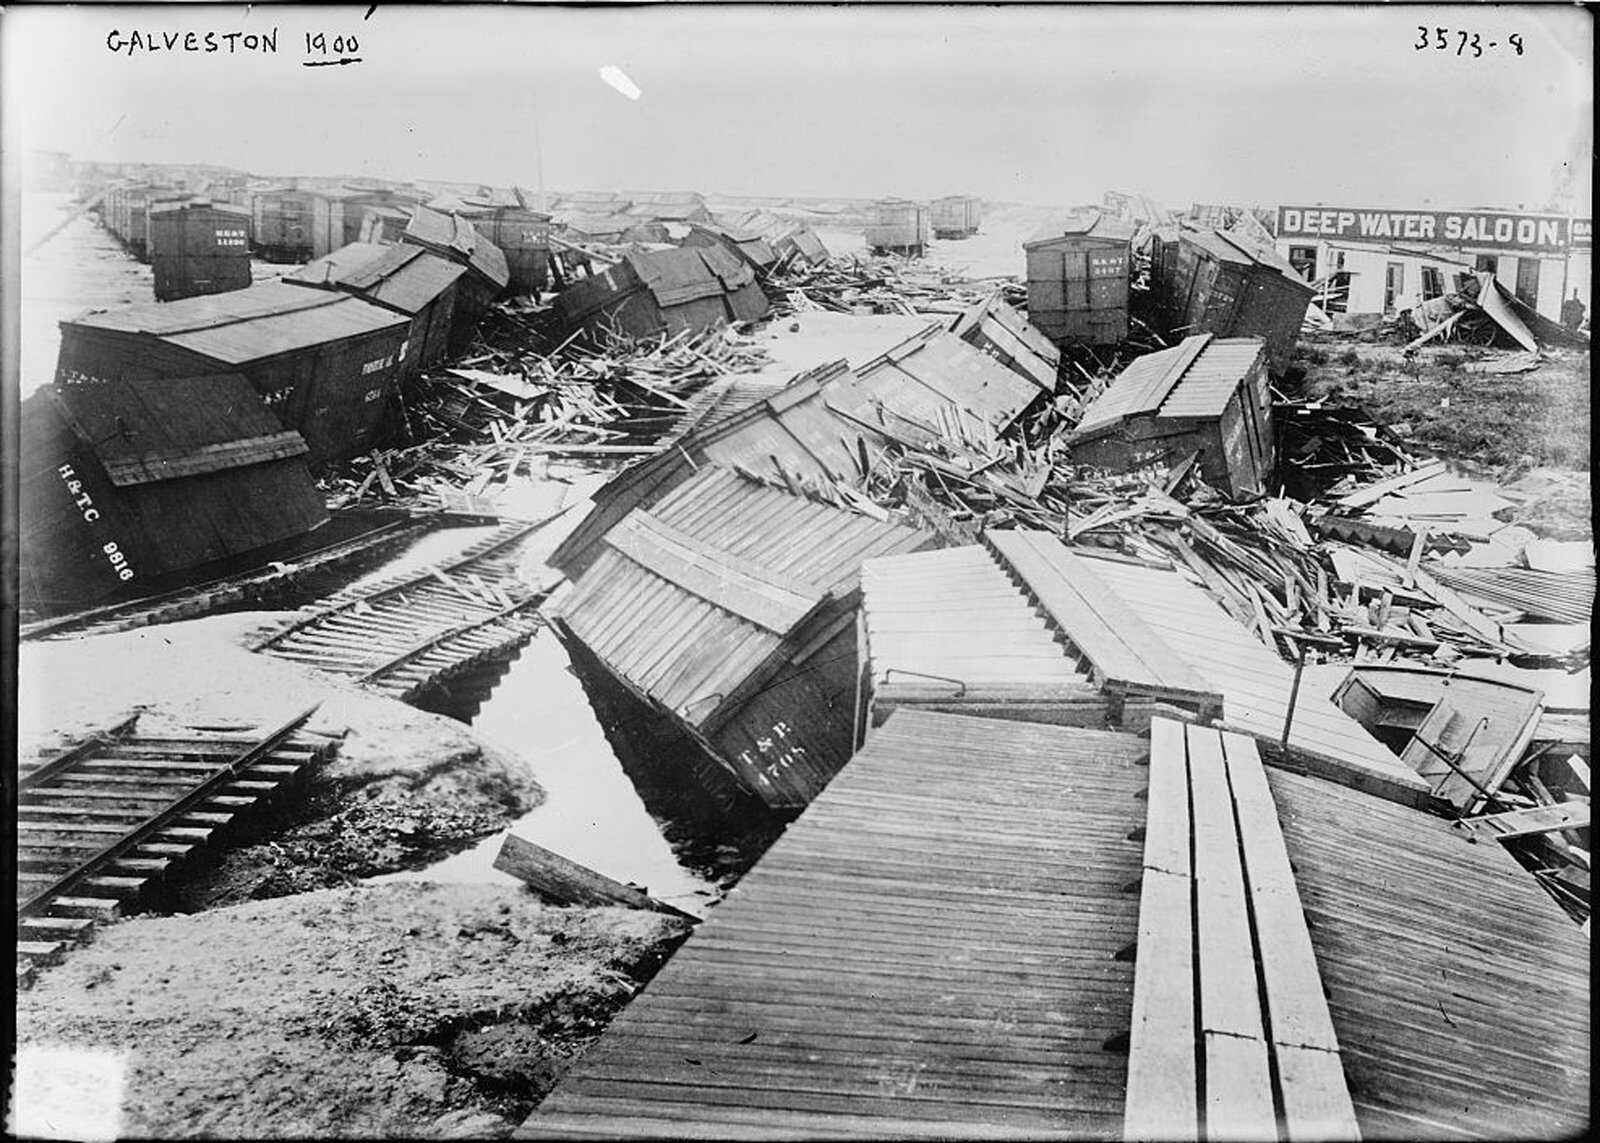 Hurricane-timeline-Galveston-1900-LOC.jpg